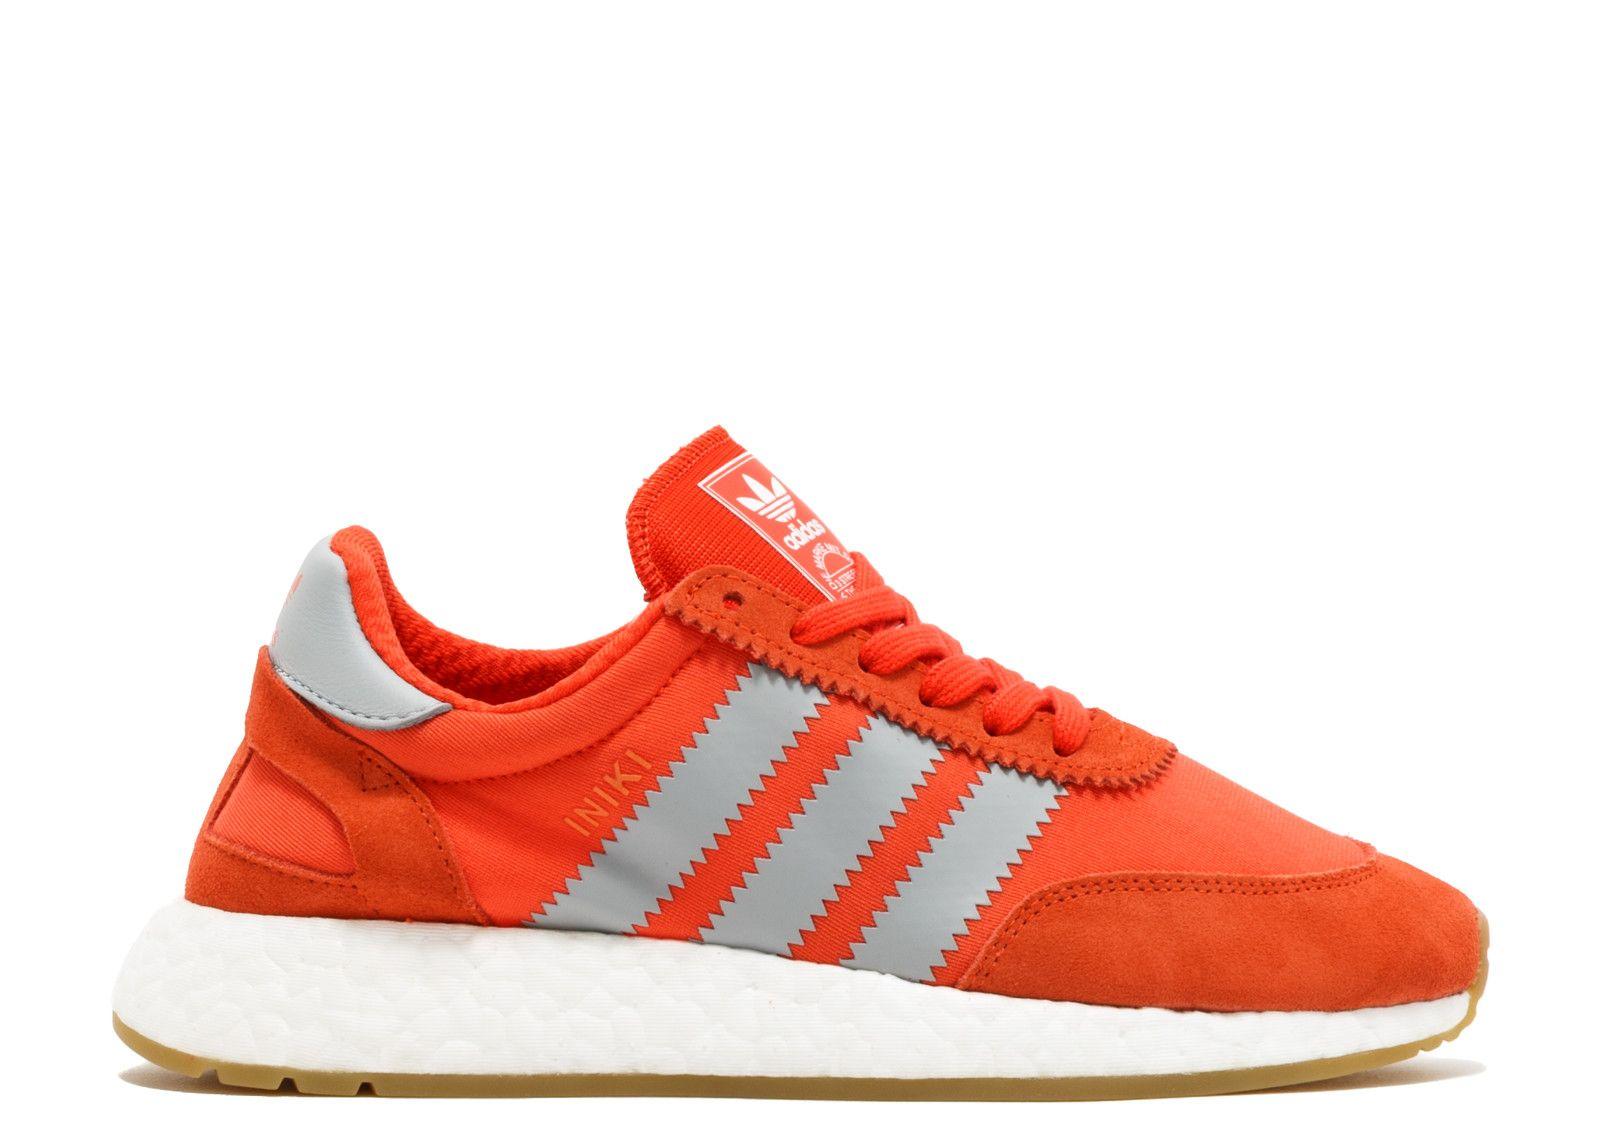 premium selection c7ed0 38494 Adidas Iniki Runner Women Ba9998 Orange White Gum Trainers